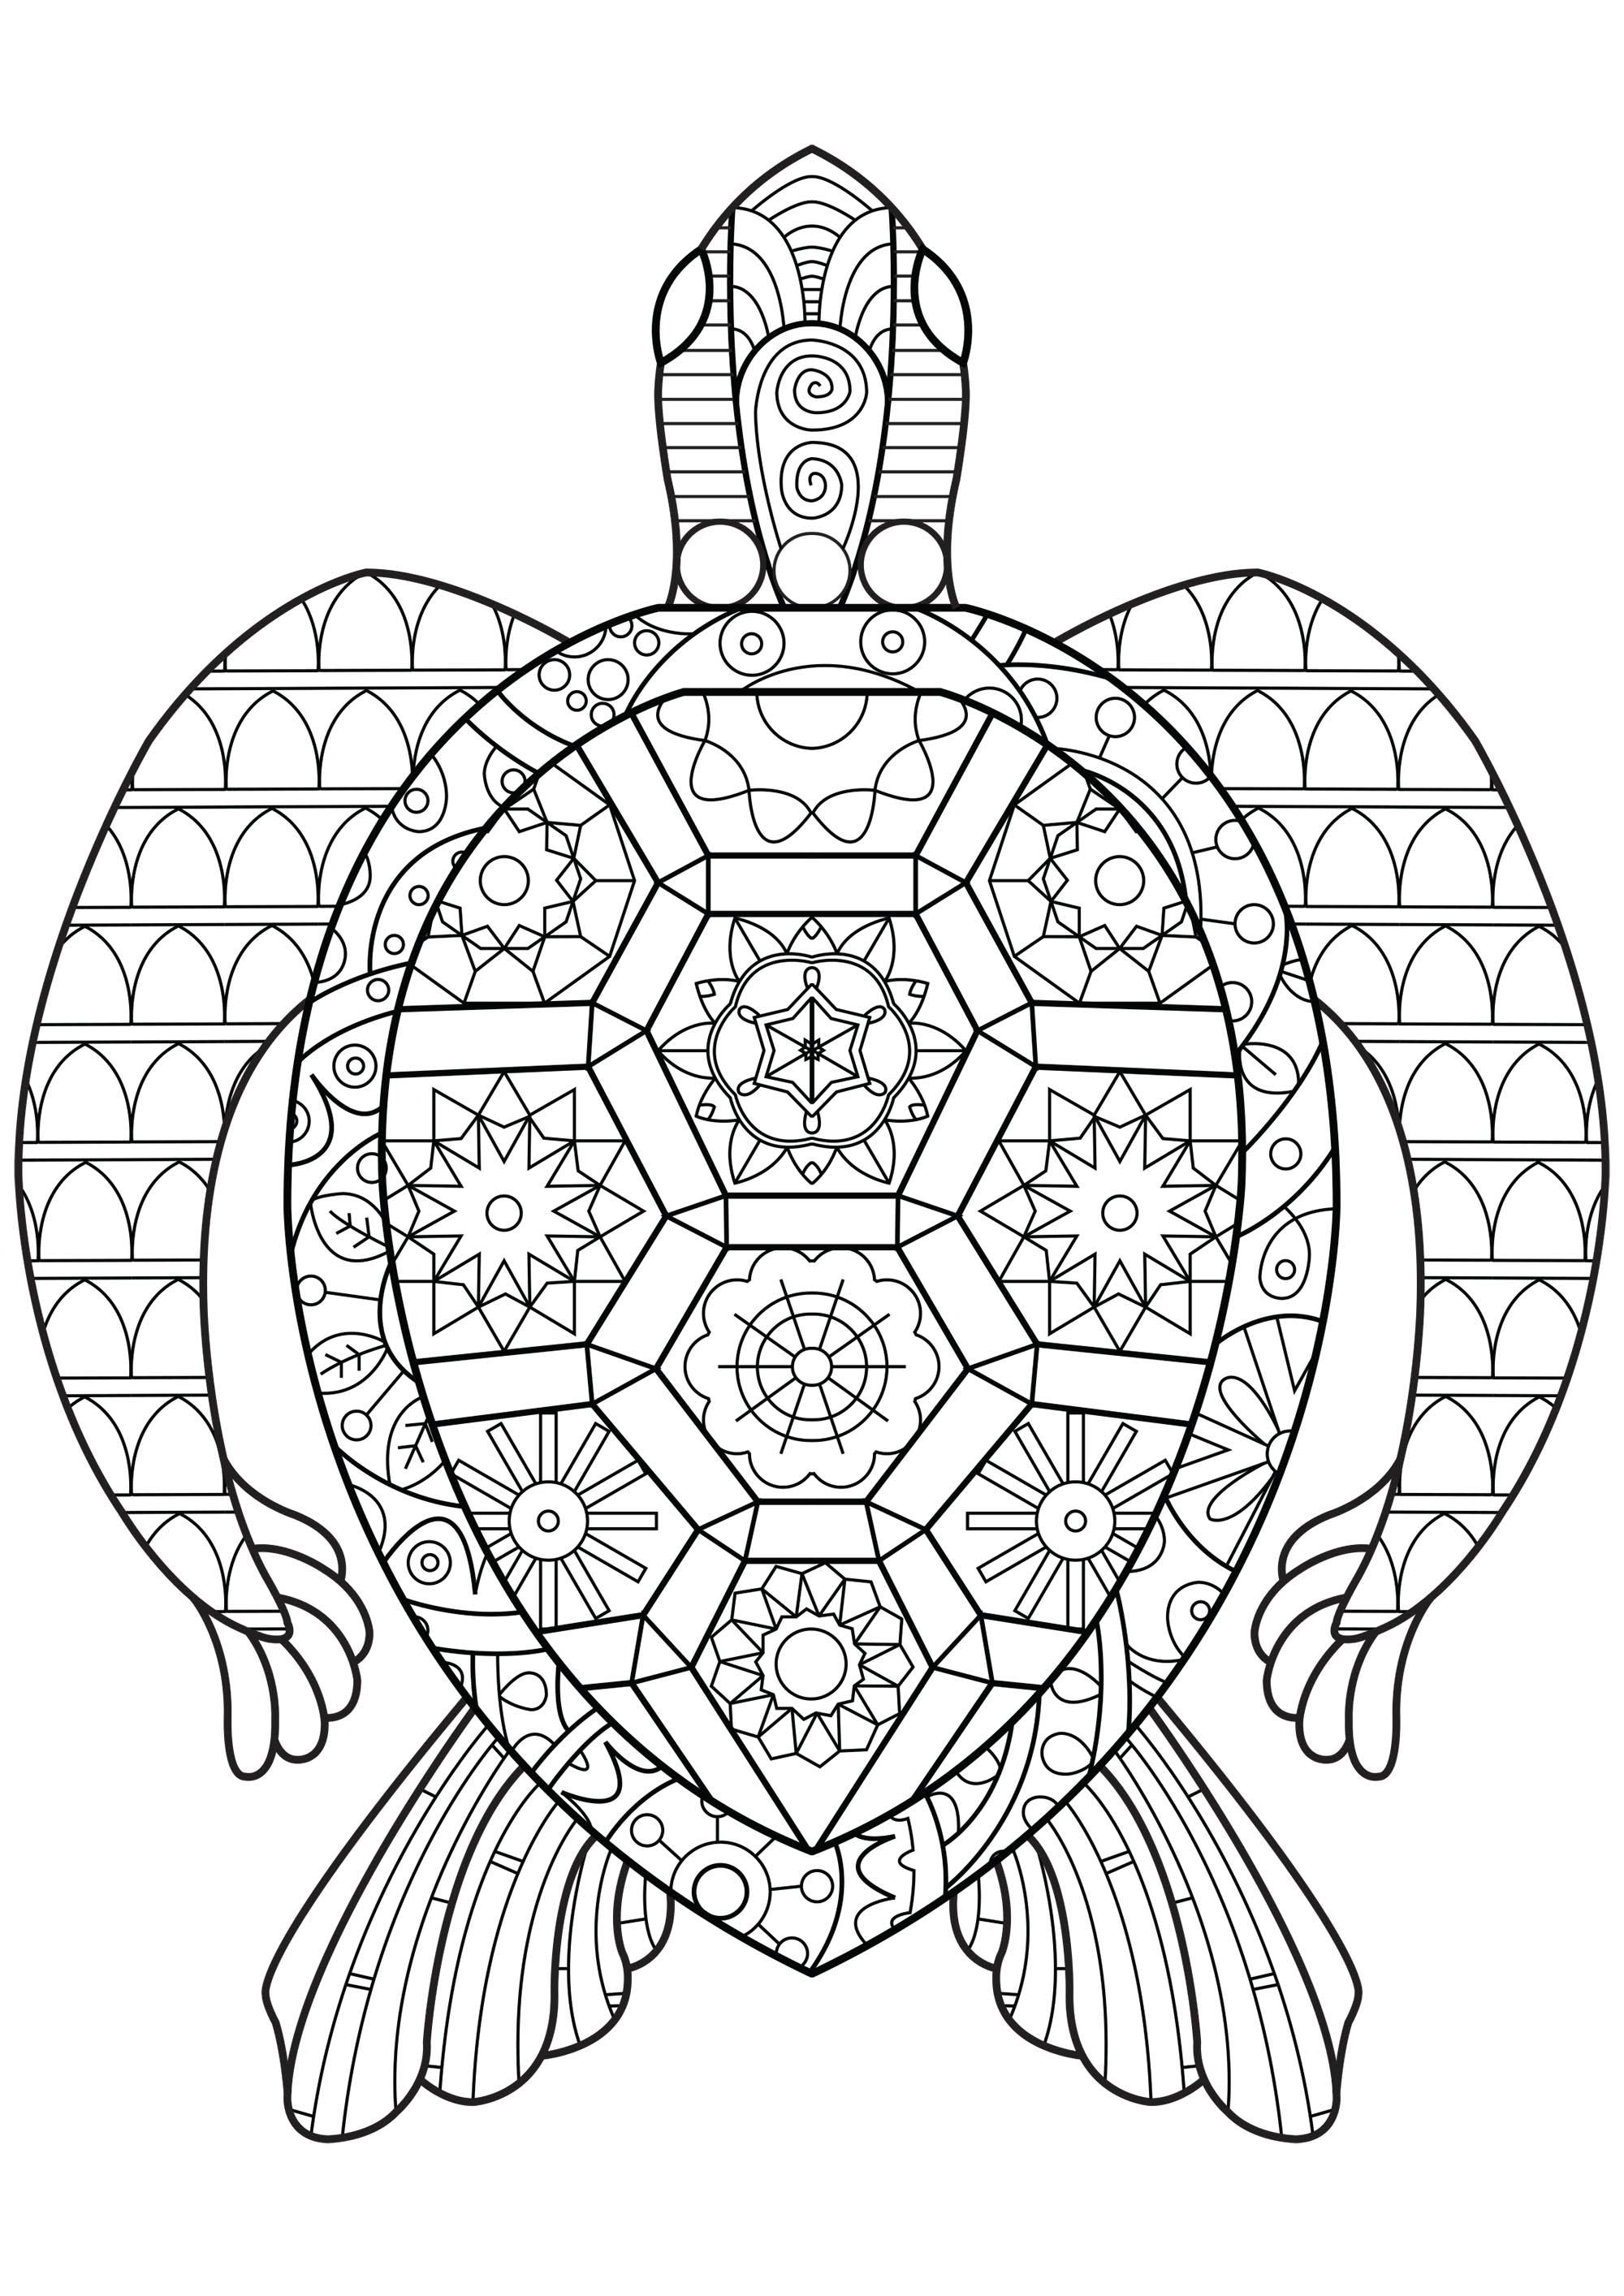 Tortugas 16281 Tortugas Colorear Para Adultos